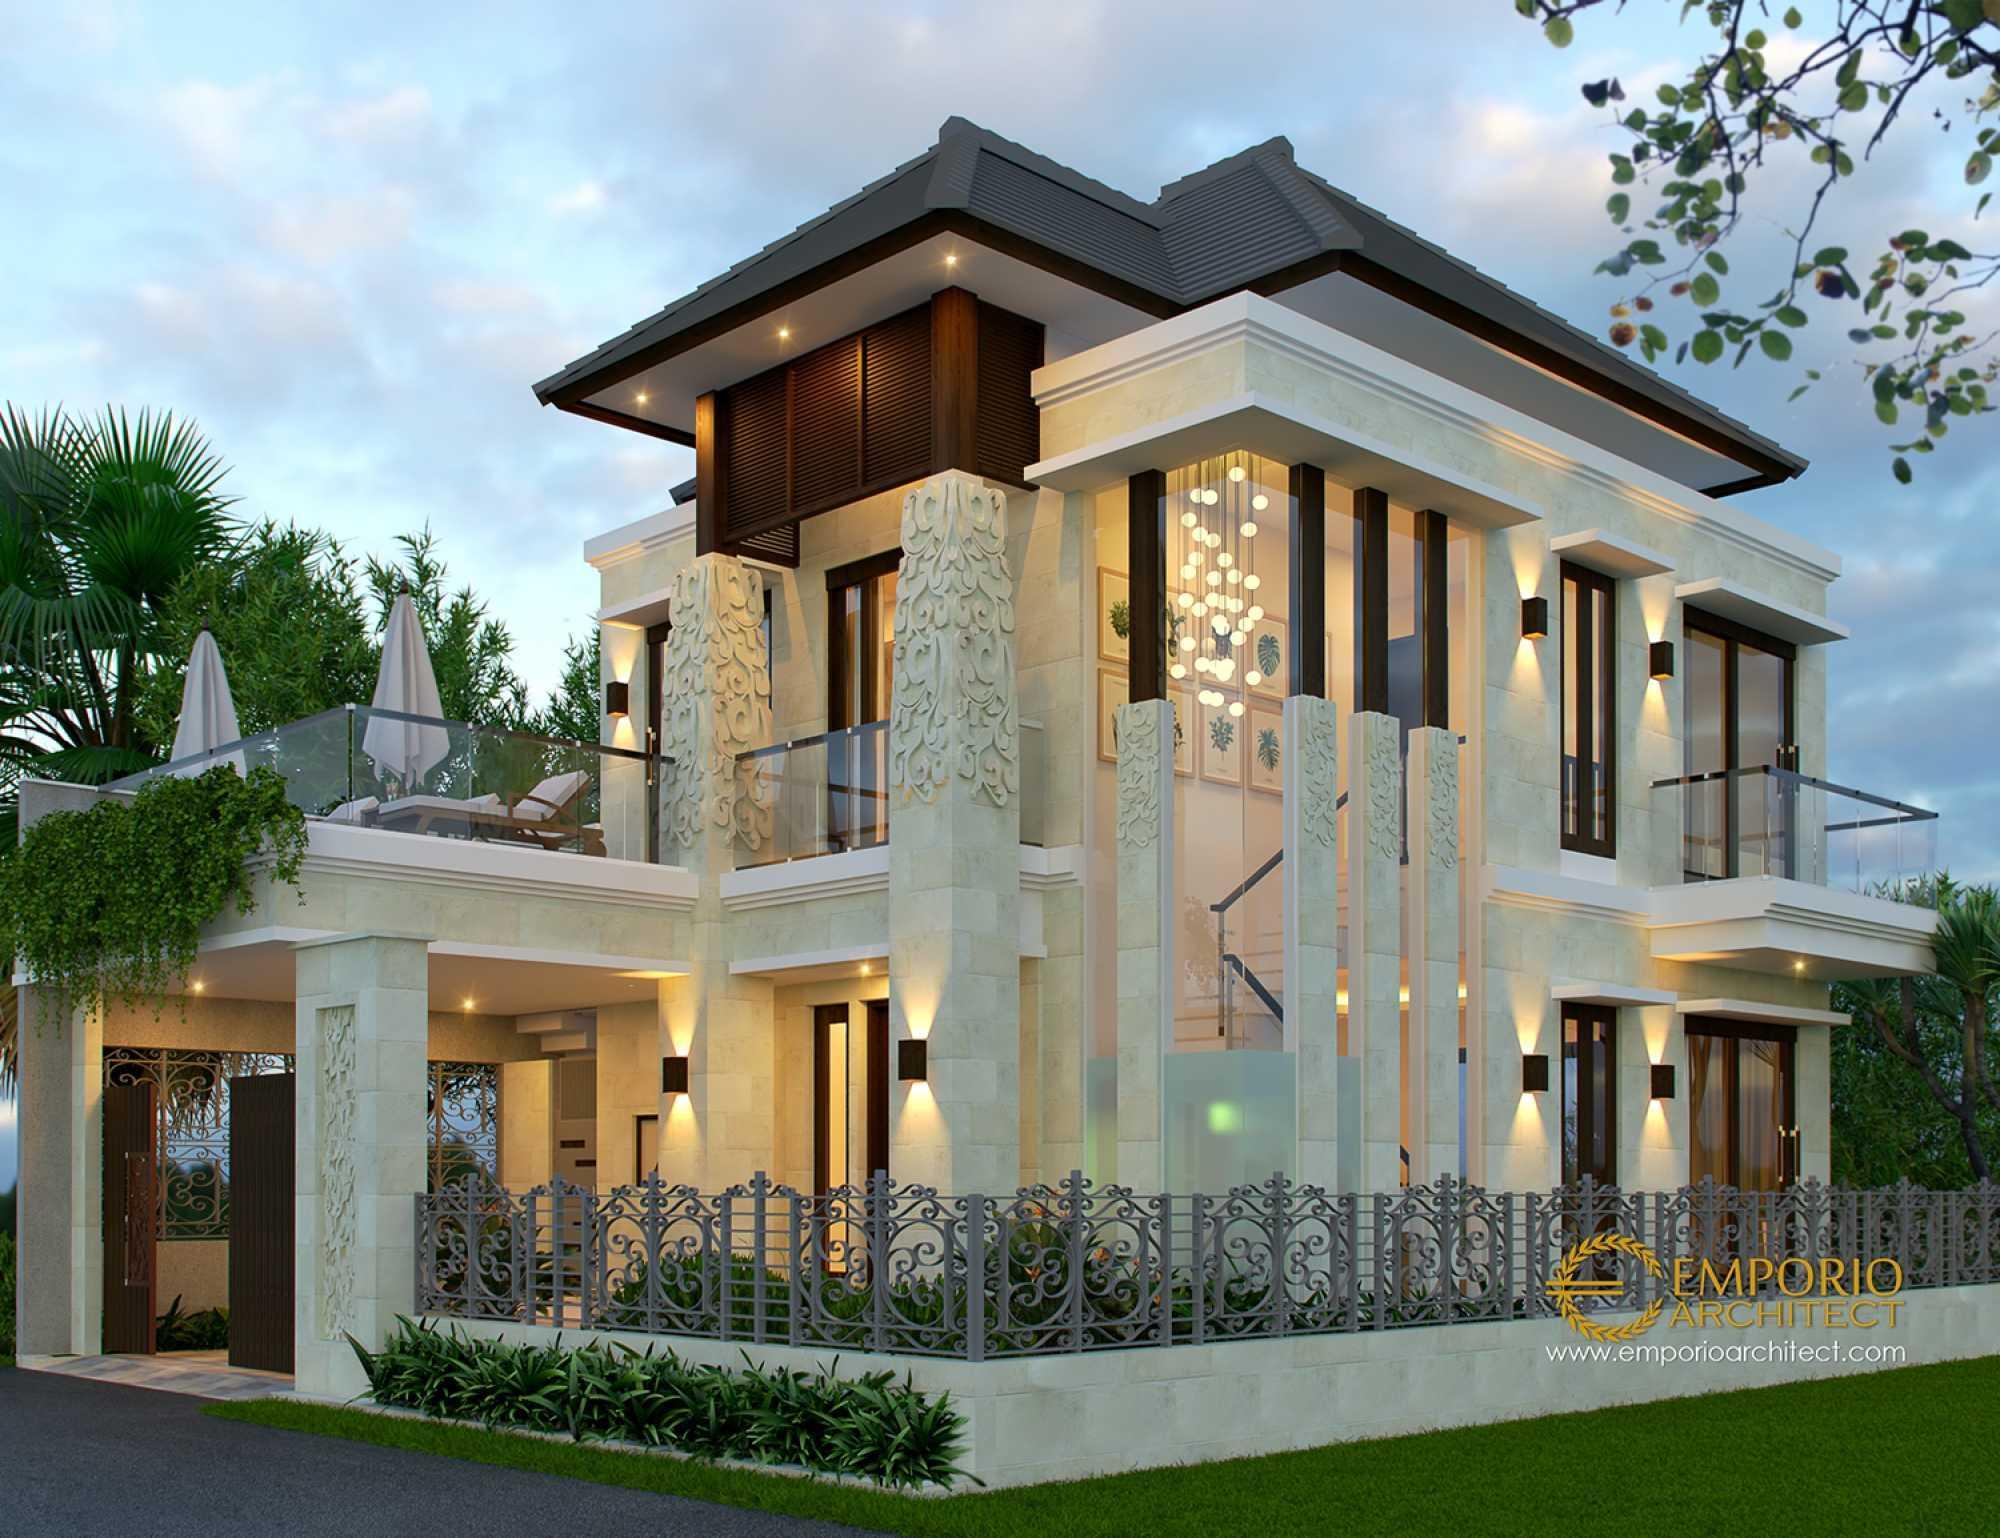 Emporio Architect Desain Rumah Villa Bali Tropis 411 @ Puncak, Bogor Puncak, Bogor, Ciloto, Kec. Cipanas, Kabupaten Cianjur, Jawa Barat, Indonesia Puncak, Bogor, Ciloto, Kec. Cipanas, Kabupaten Cianjur, Jawa Barat, Indonesia Emporio-Architect-Desain-Rumah-Villa-Bali-Tropis-411-Puncak-Bogor  77337